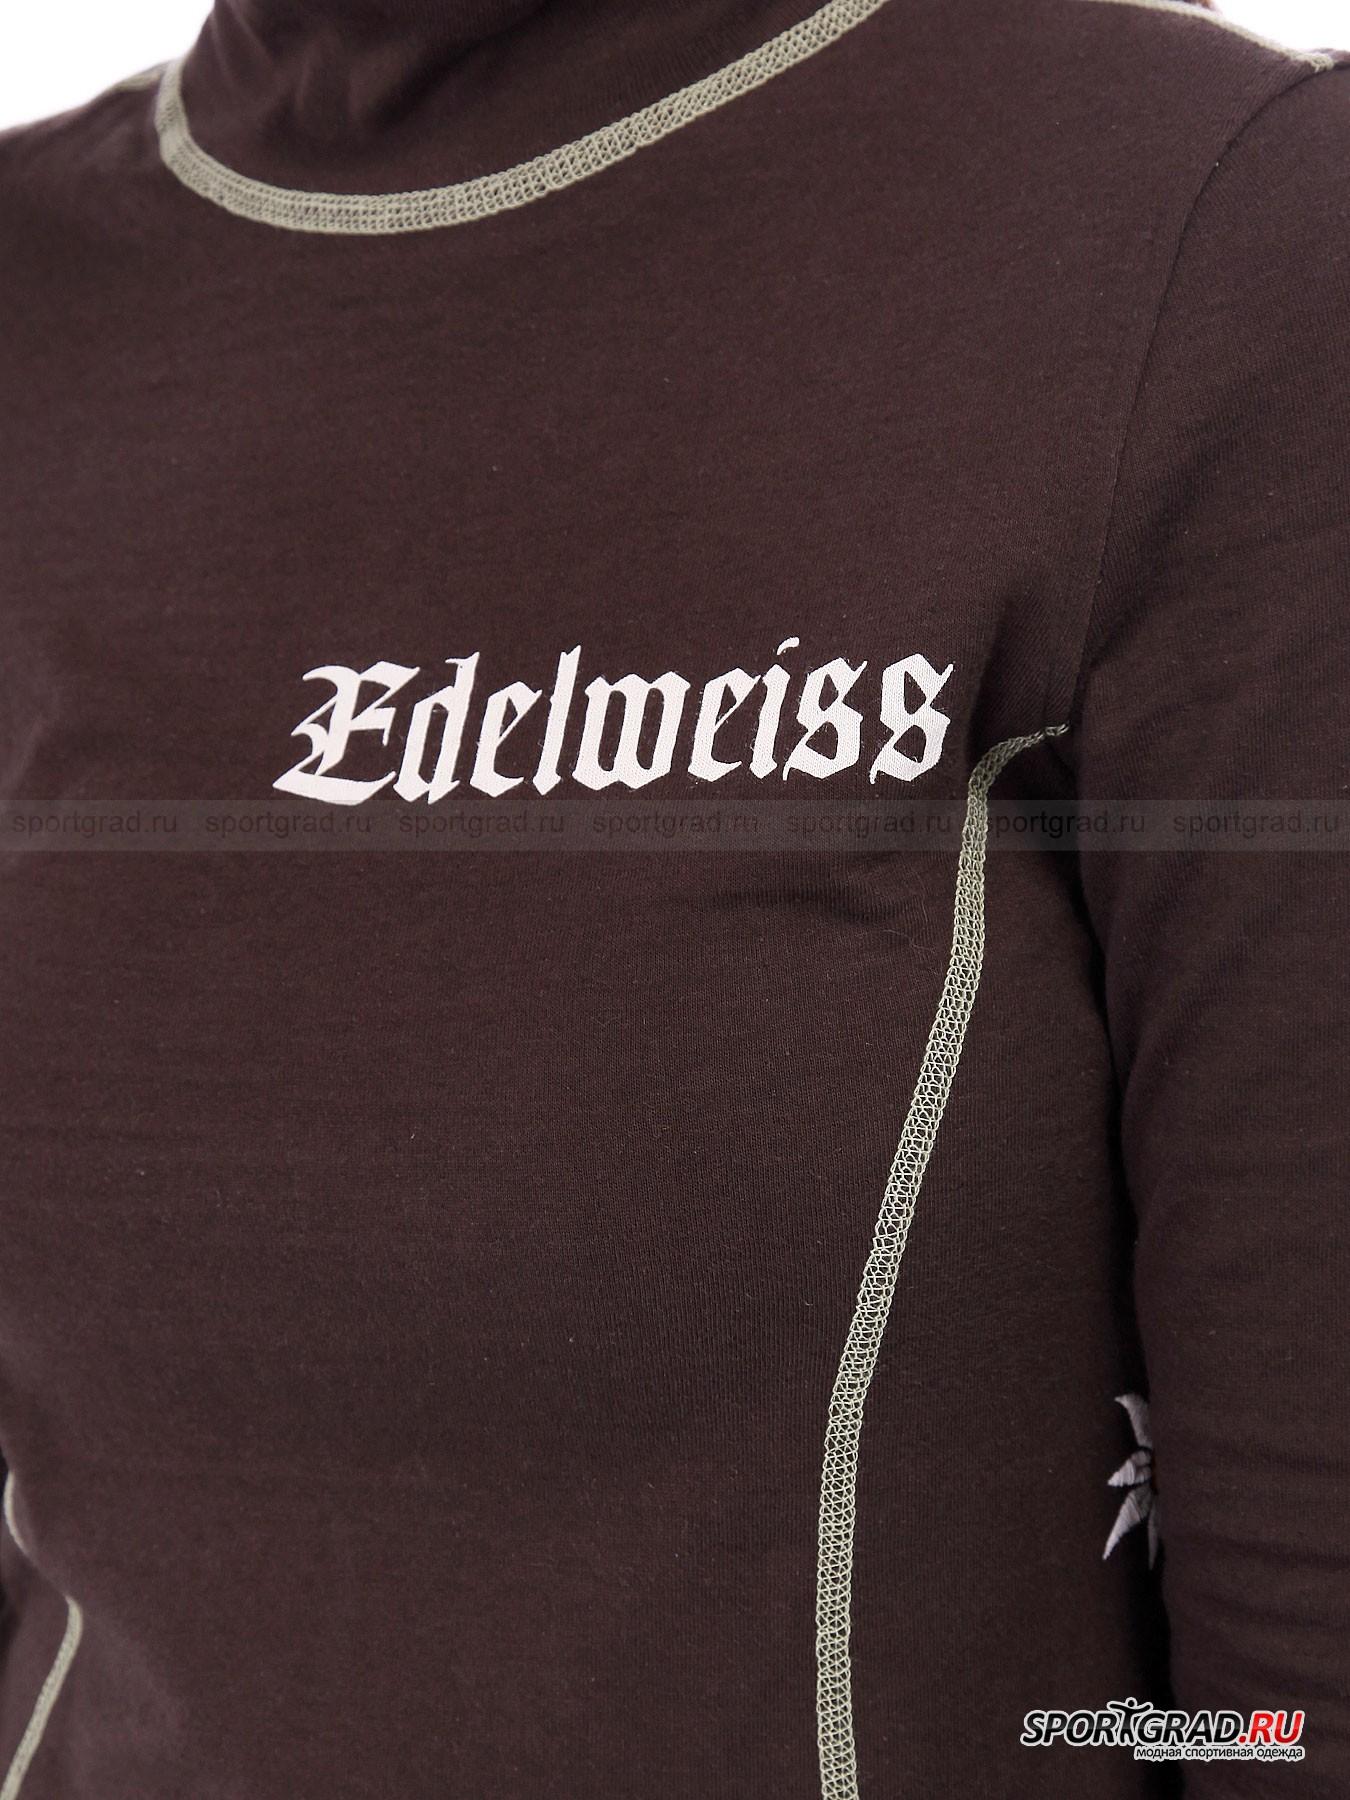 Водолазка женская Edelweiss ALP-N-ROCK от Спортград